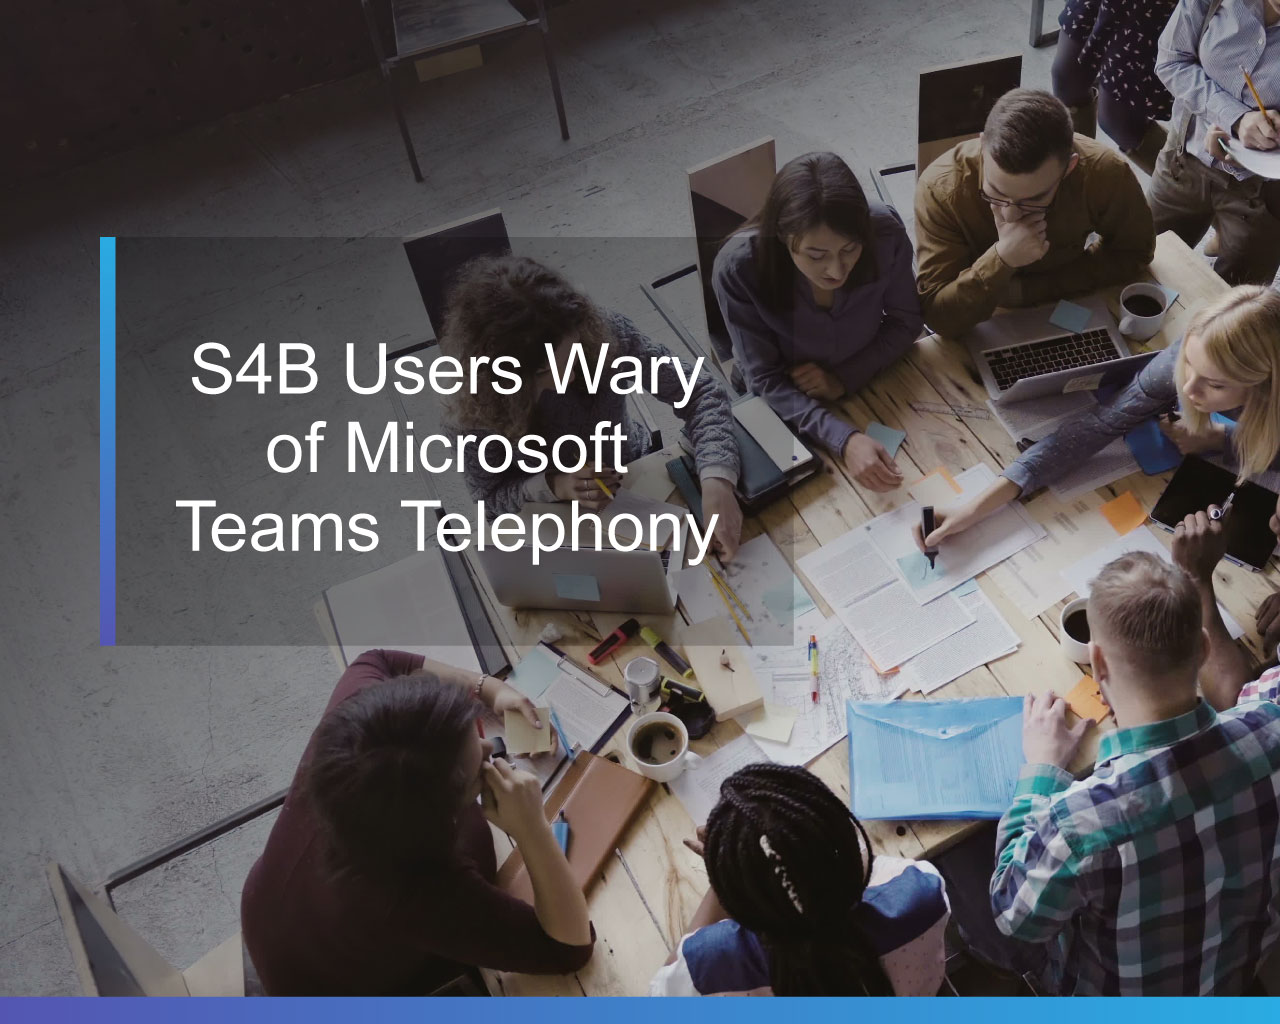 S4B Users Wary of Microsoft Teams Telephony